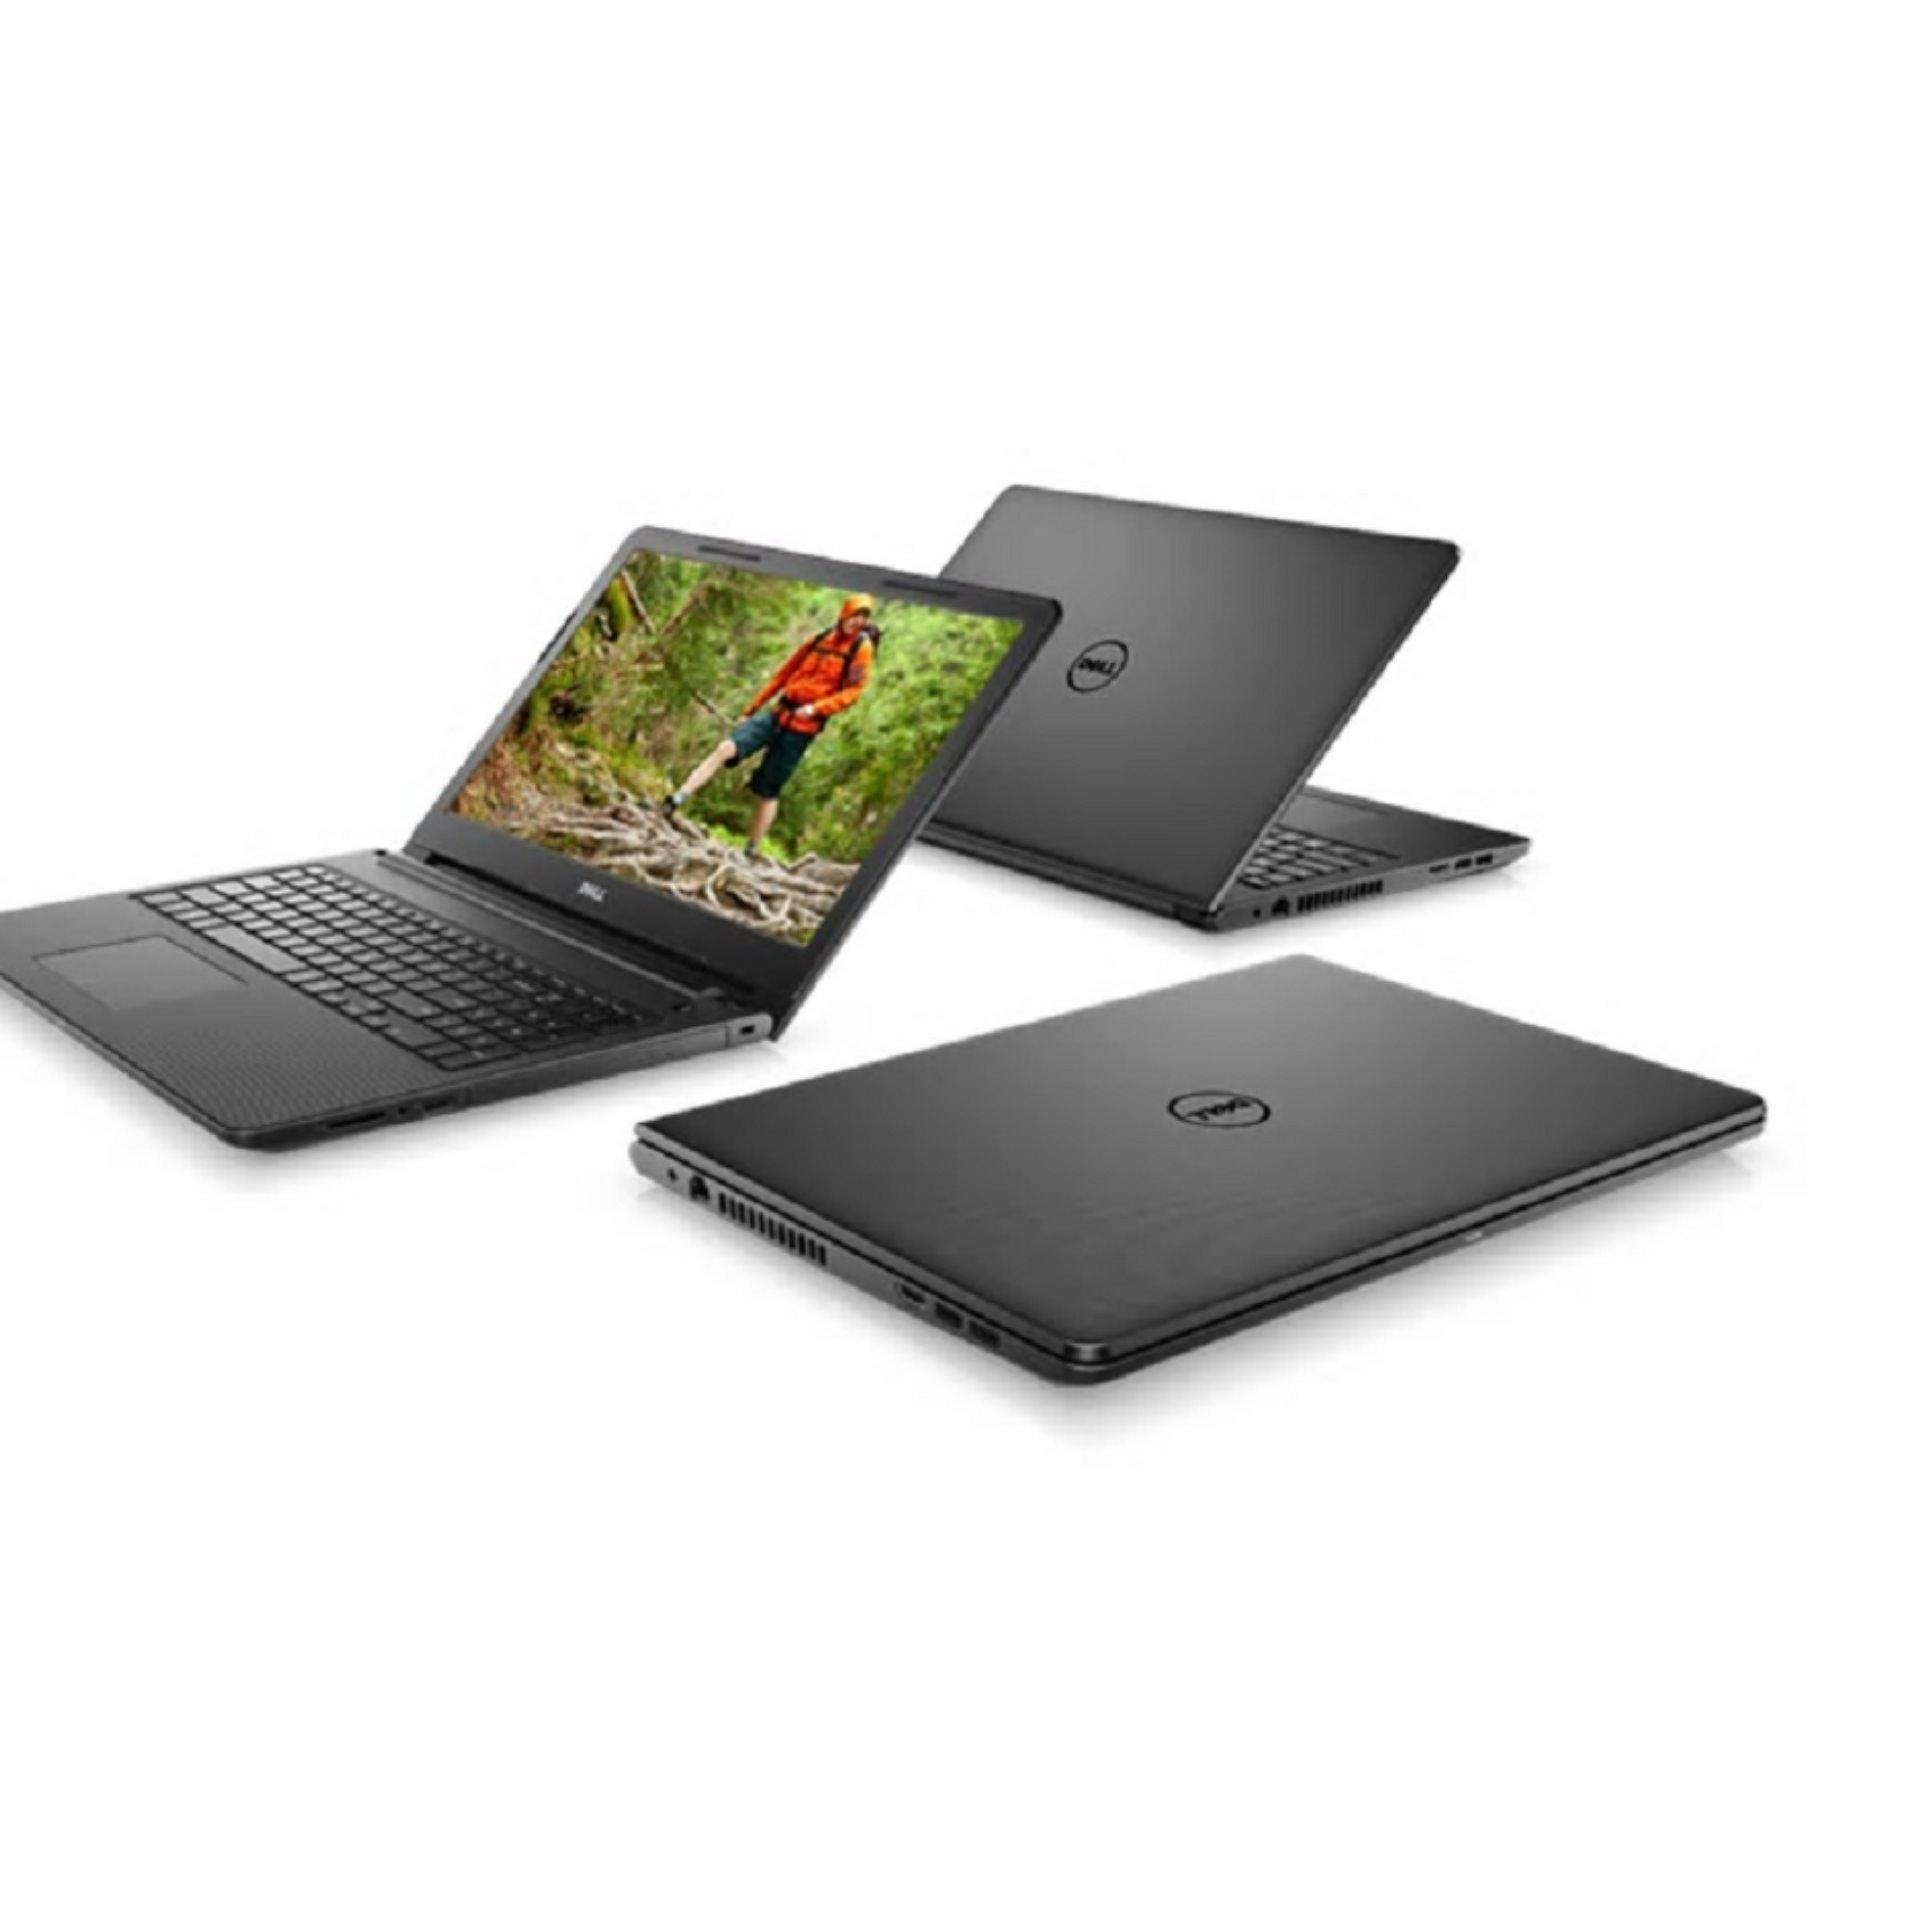 New INSPIRON 15 3000 SERIES 3567 7th Gen i5 7200U 8GB 1TB Windows 10 Home 15 inch FHD